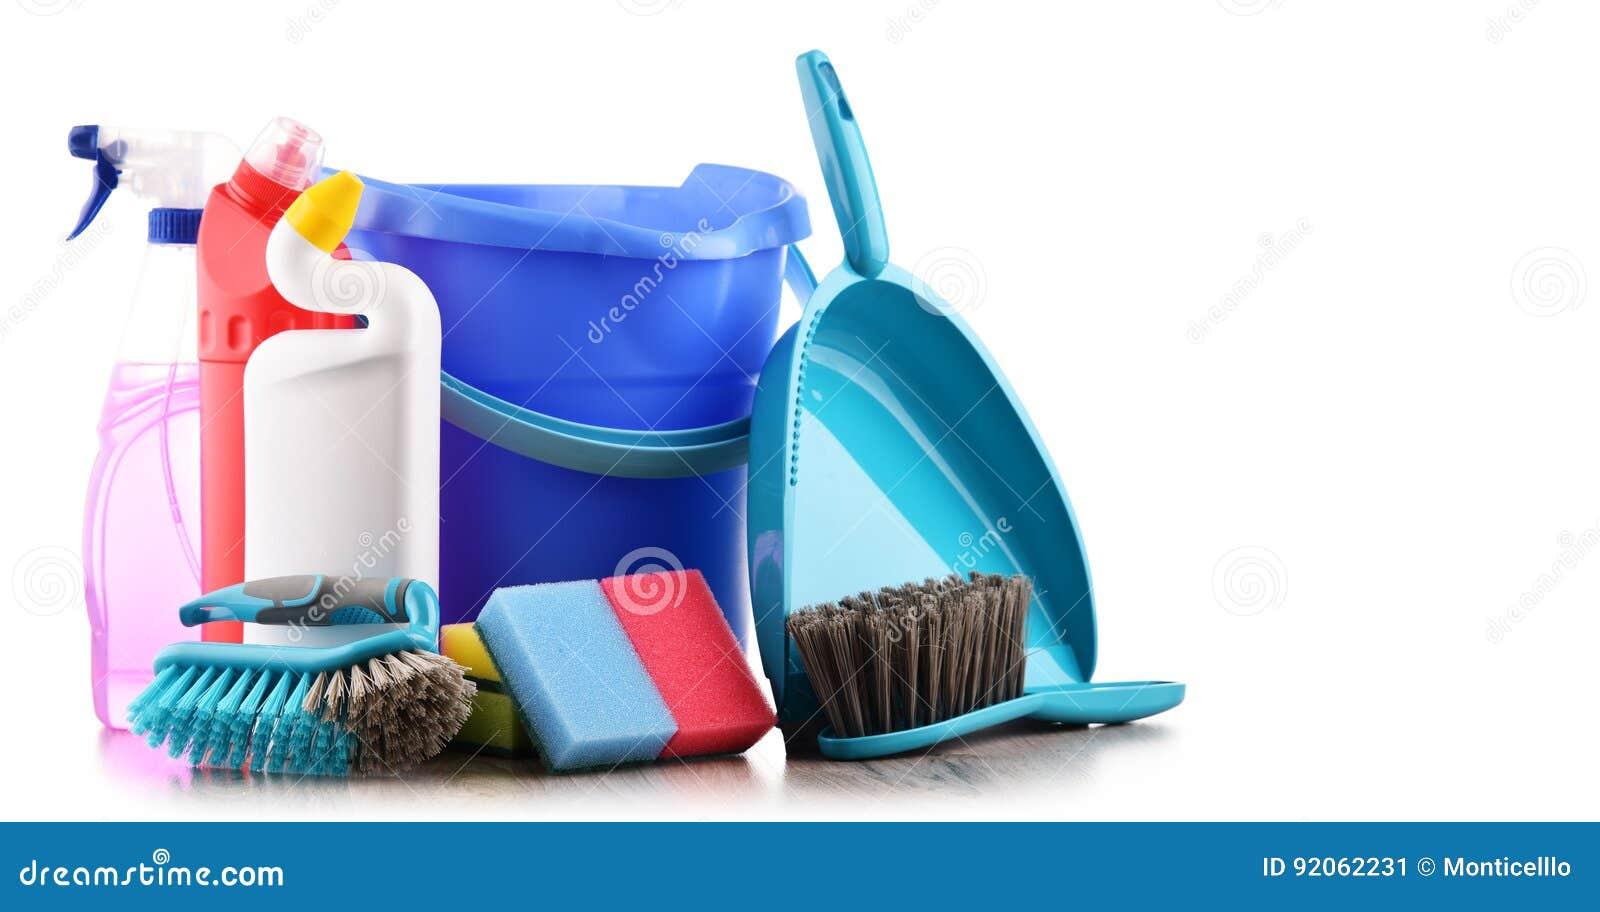 Variedade de garrafas detergentes e de fontes de limpeza química